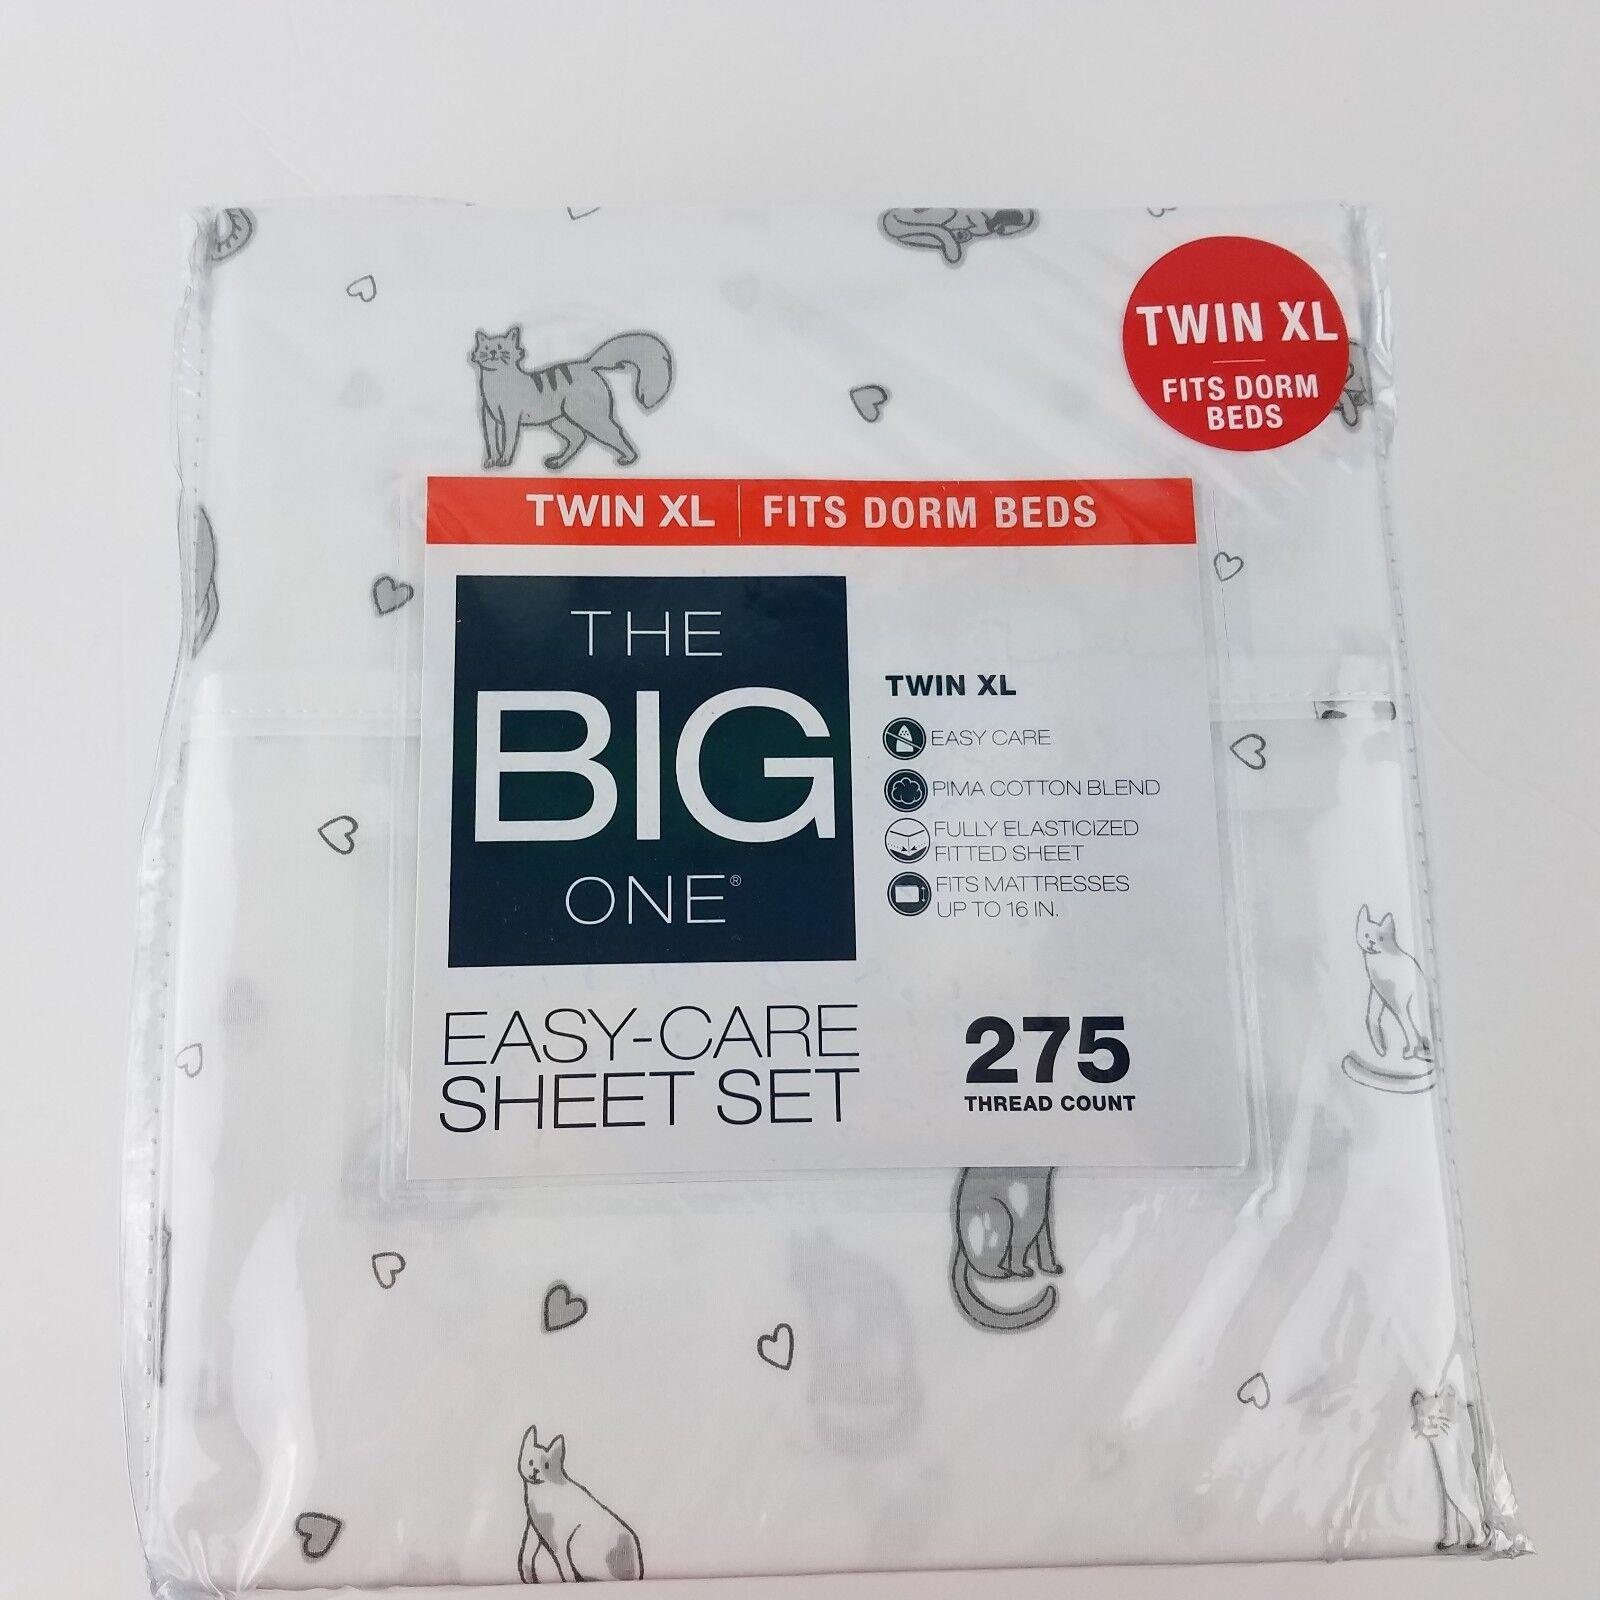 New The Big One Cats Twin XL Sheet Set Fits College Dorm Beds 3 piece Set Pima